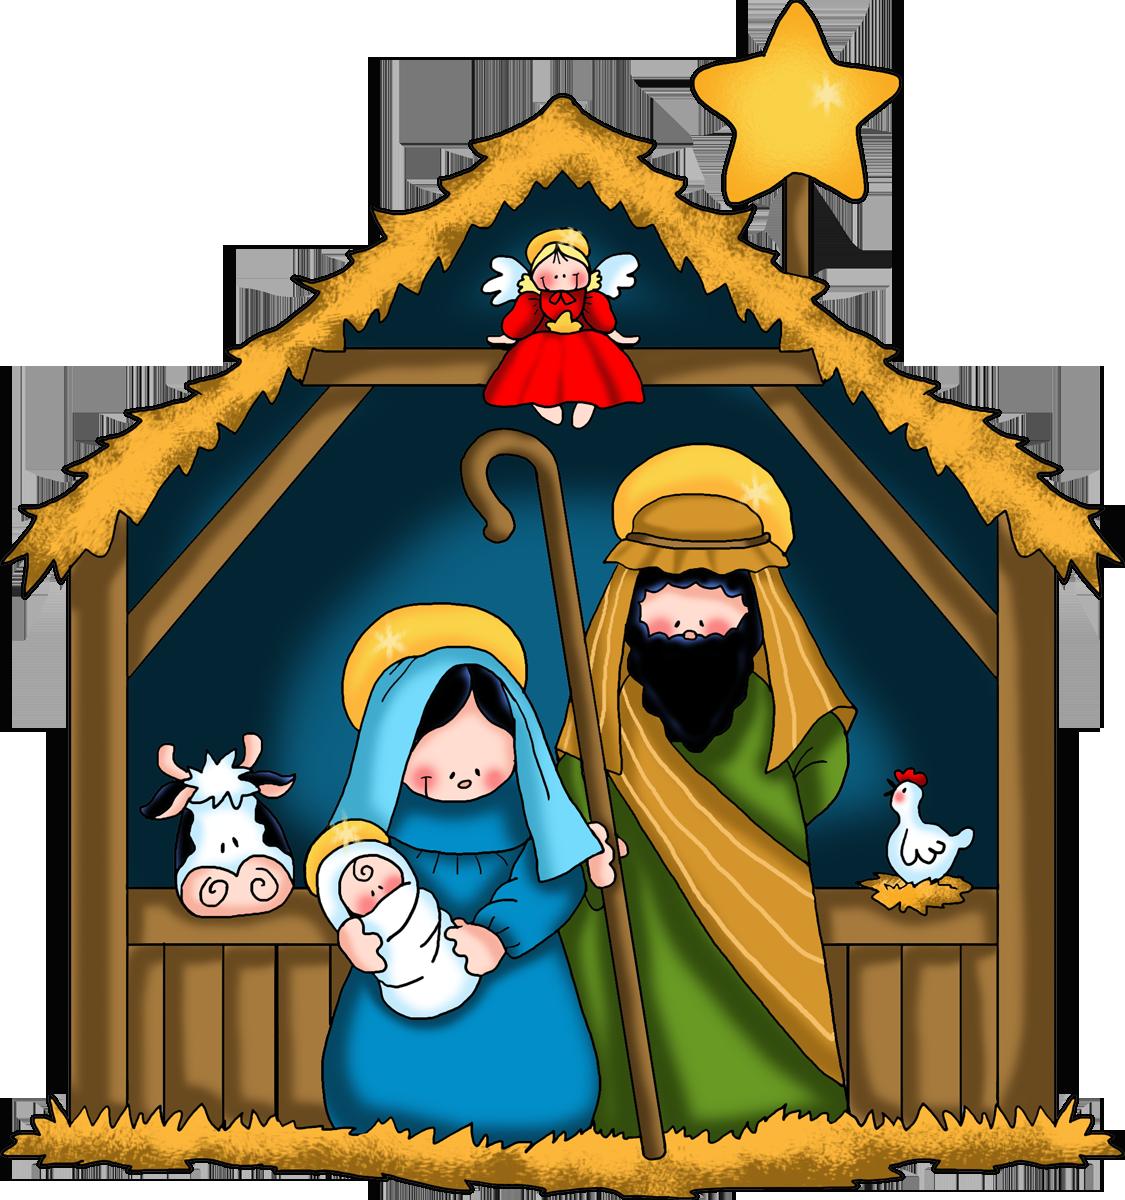 Nativity Scene Clipart New Calendar Temp-Nativity Scene Clipart New Calendar Template Site-14